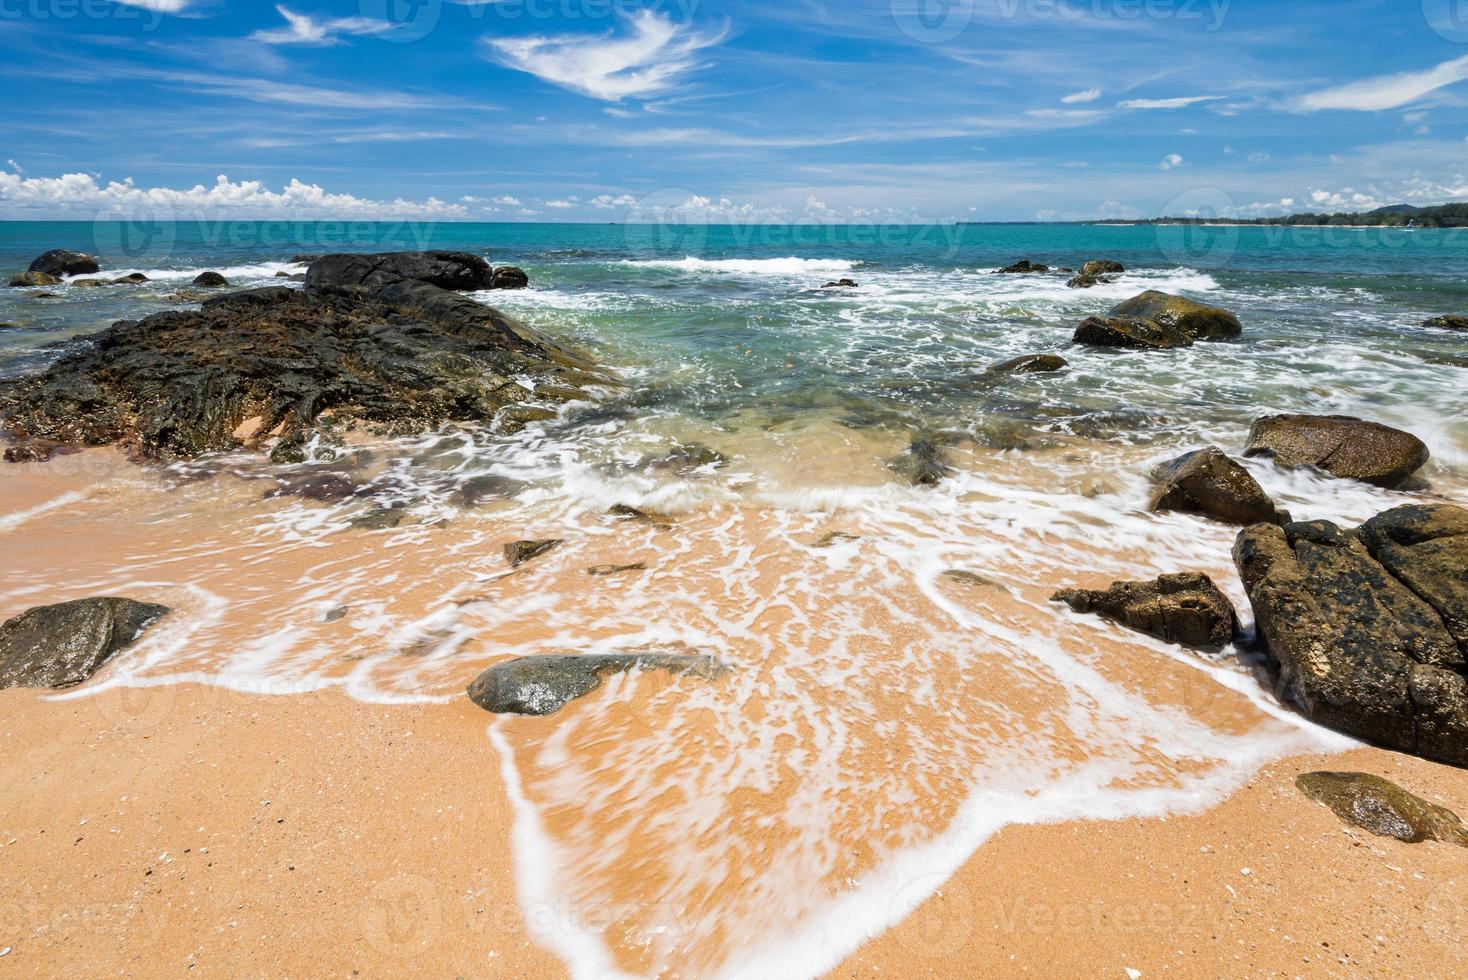 ondas do mar lash line impacto rocha na praia foto